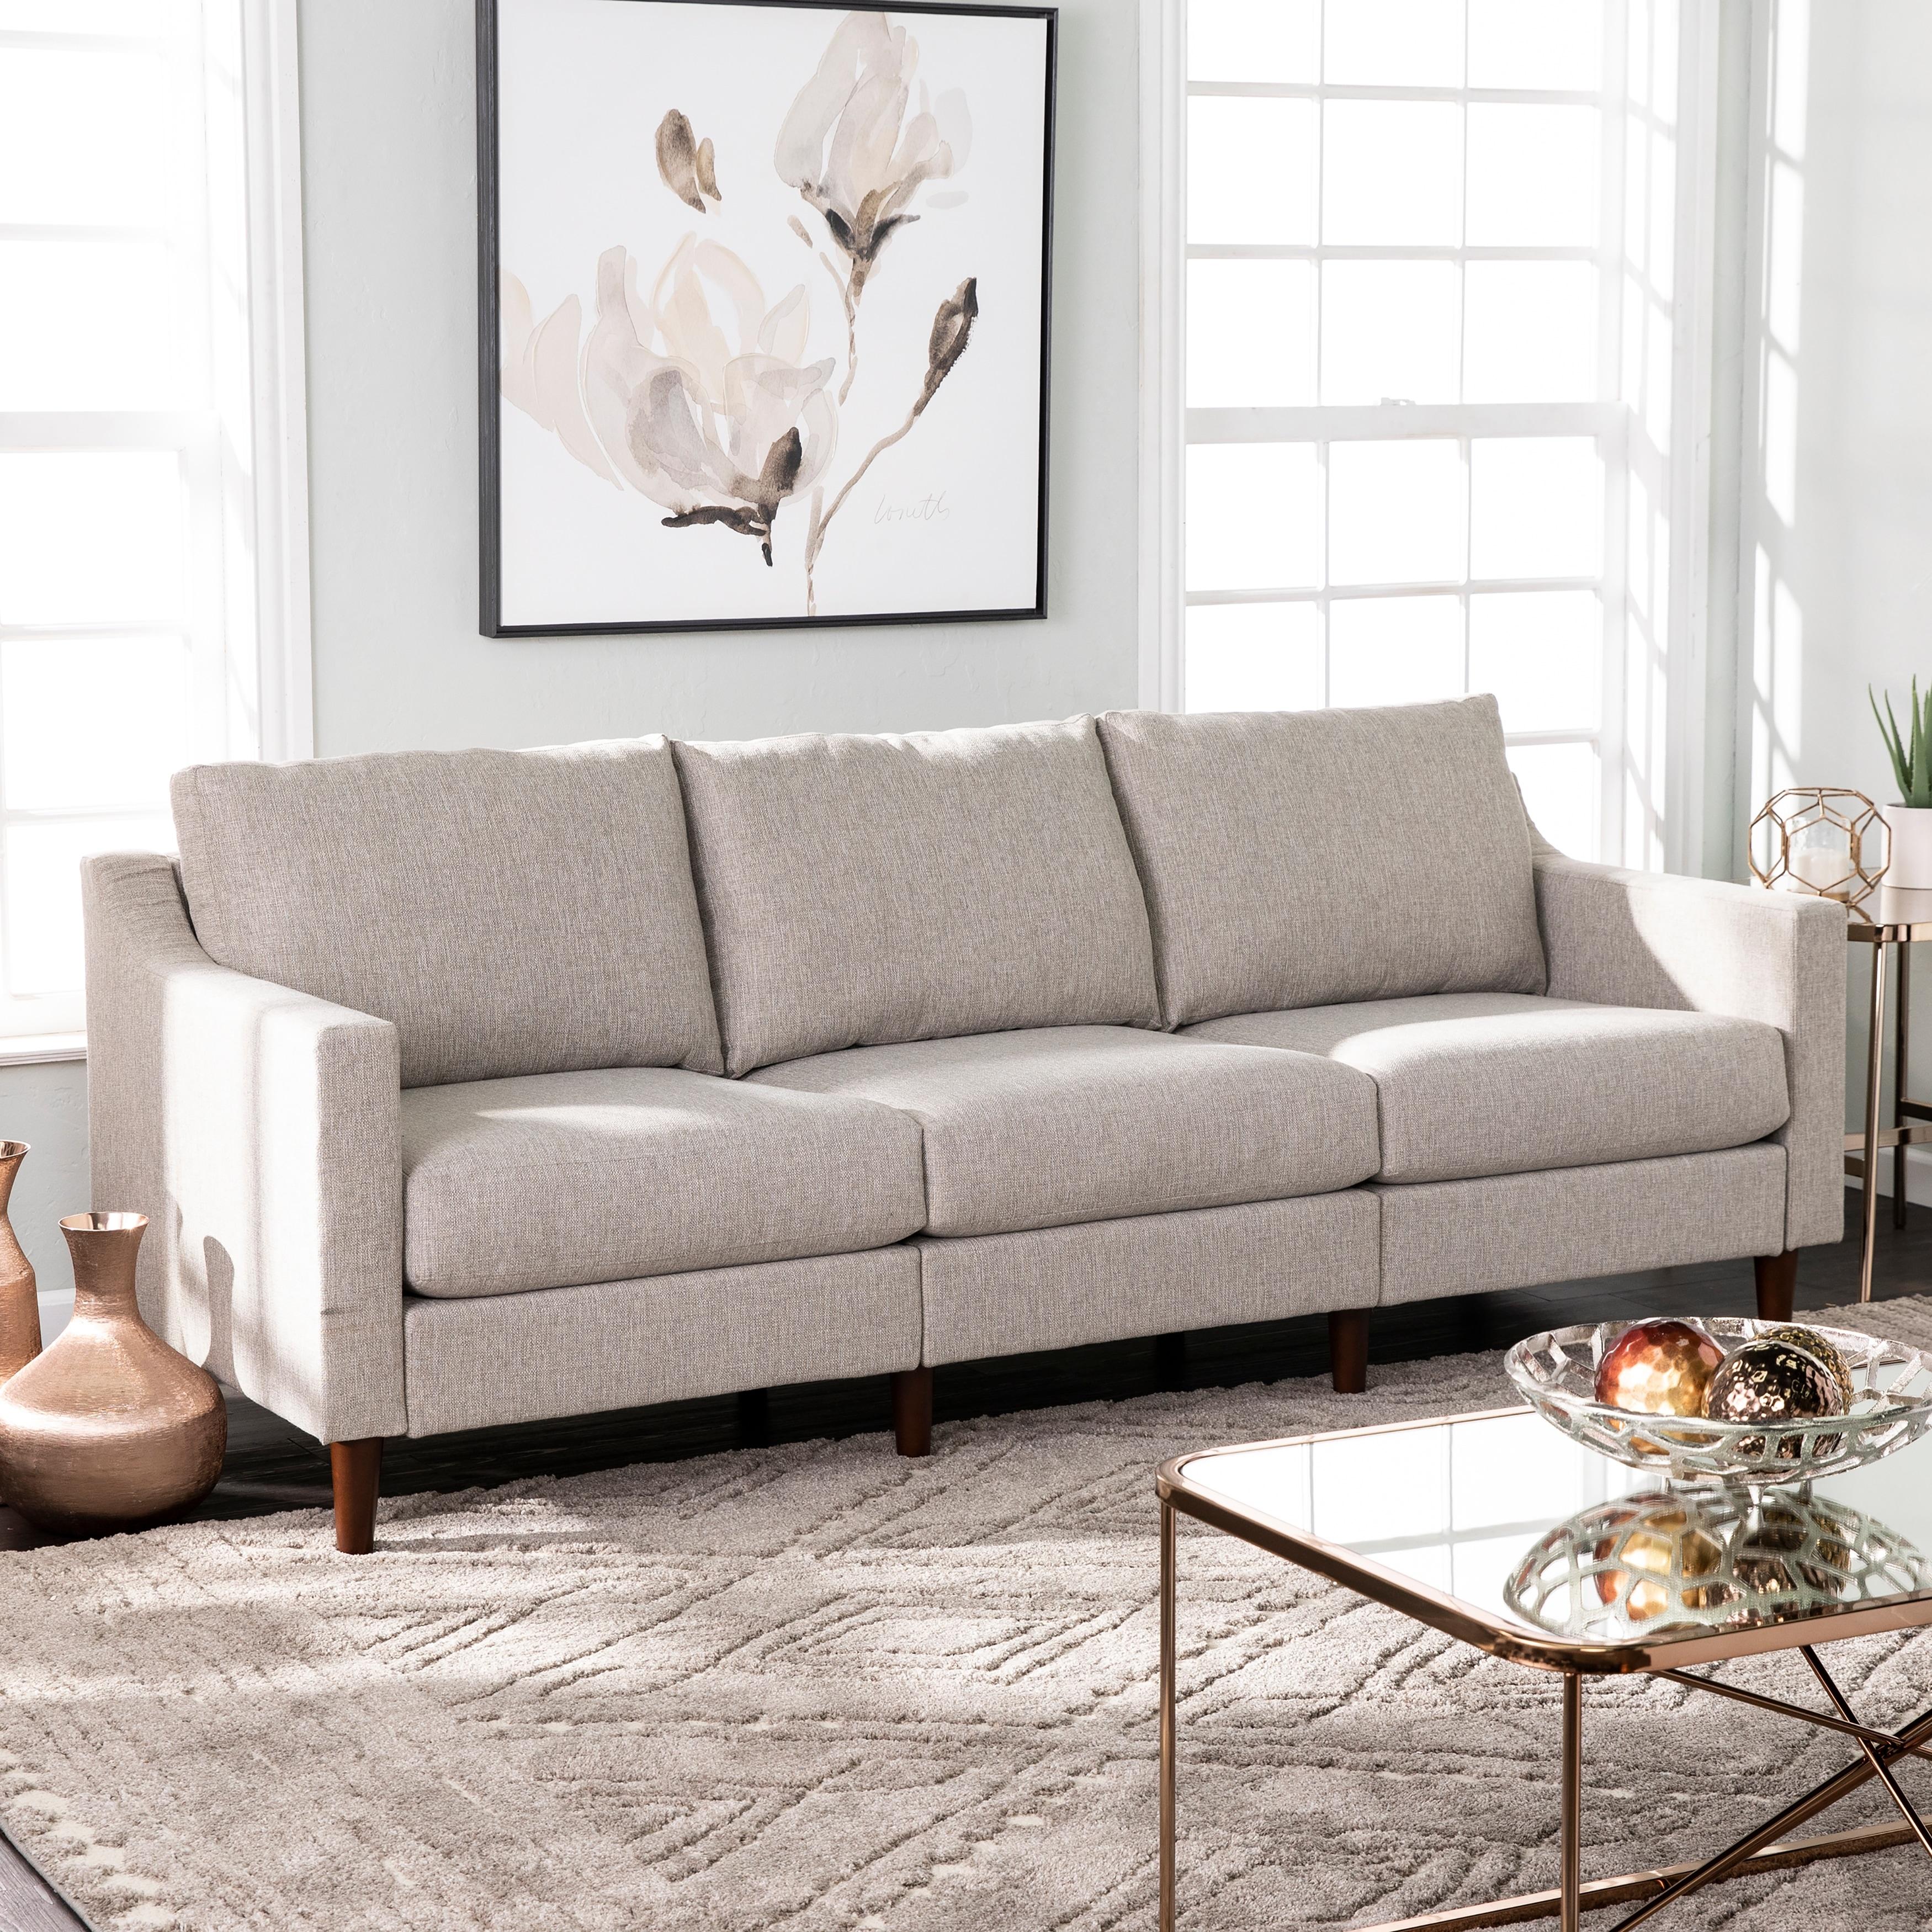 Davis Transitional Fabric Oversized Sofa Overstock 29209187